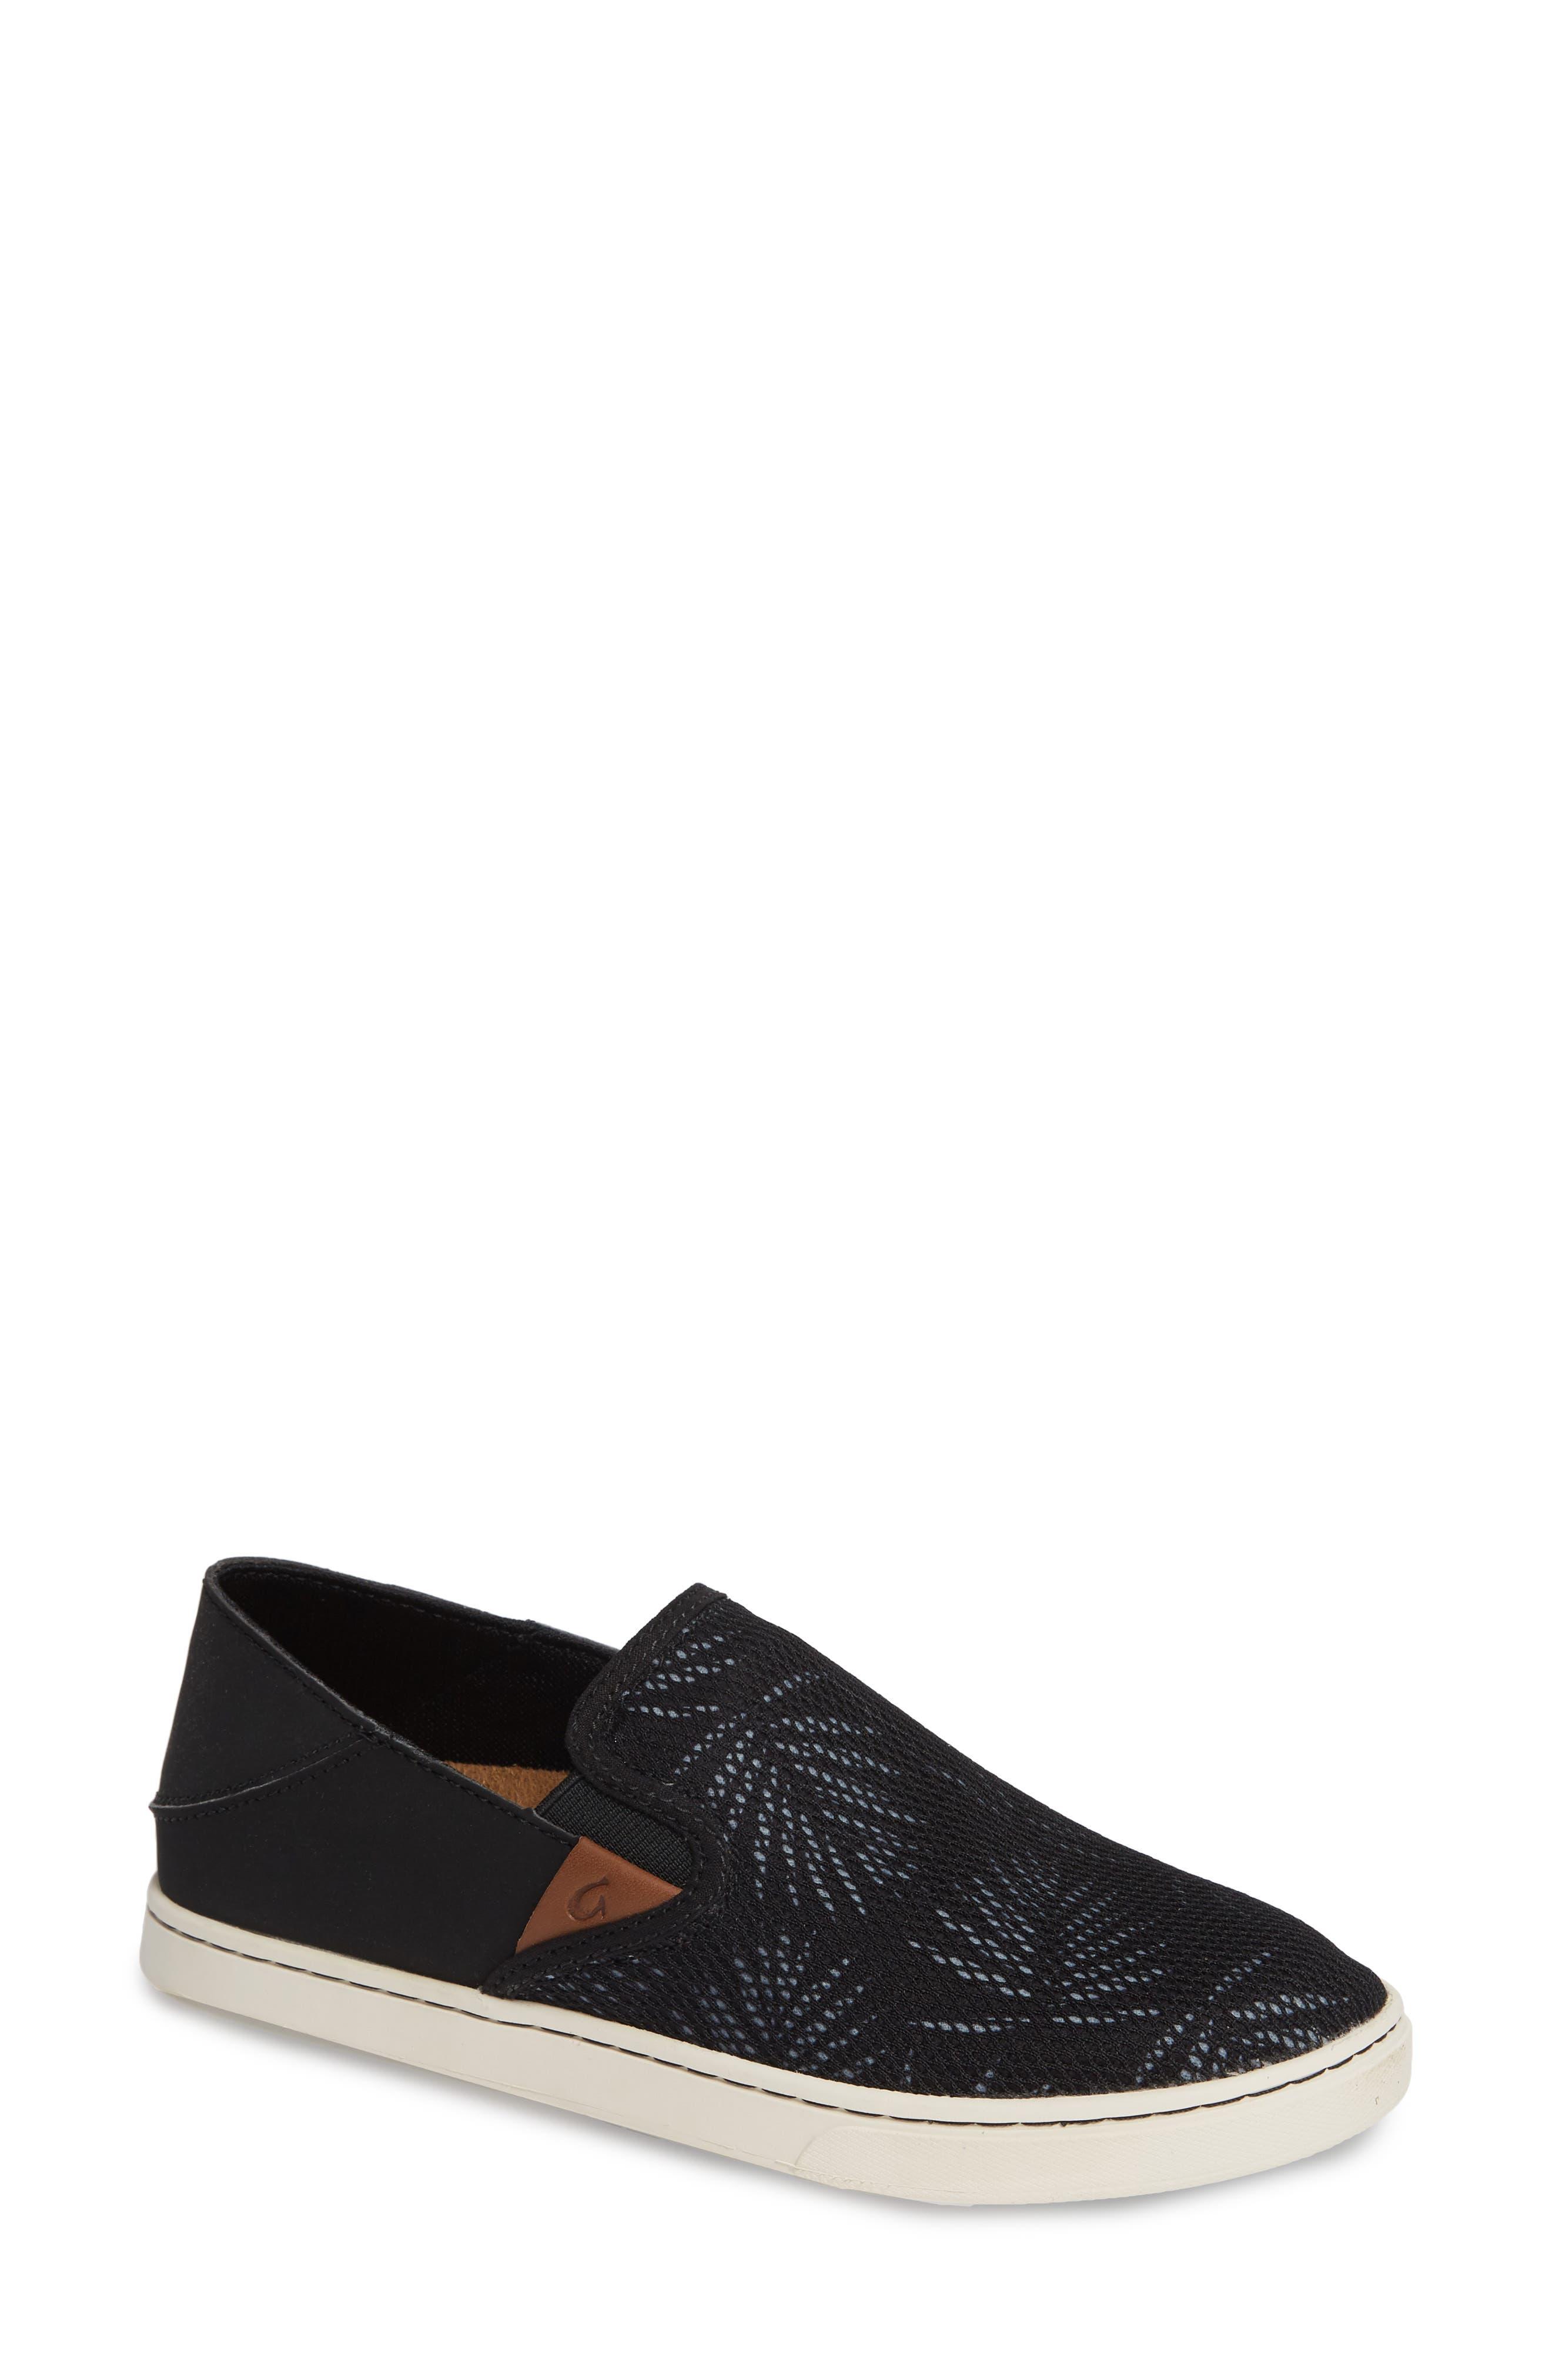 'Pehuea' Slip-On Sneaker,                             Main thumbnail 1, color,                             BLACK/ PALM FABRIC